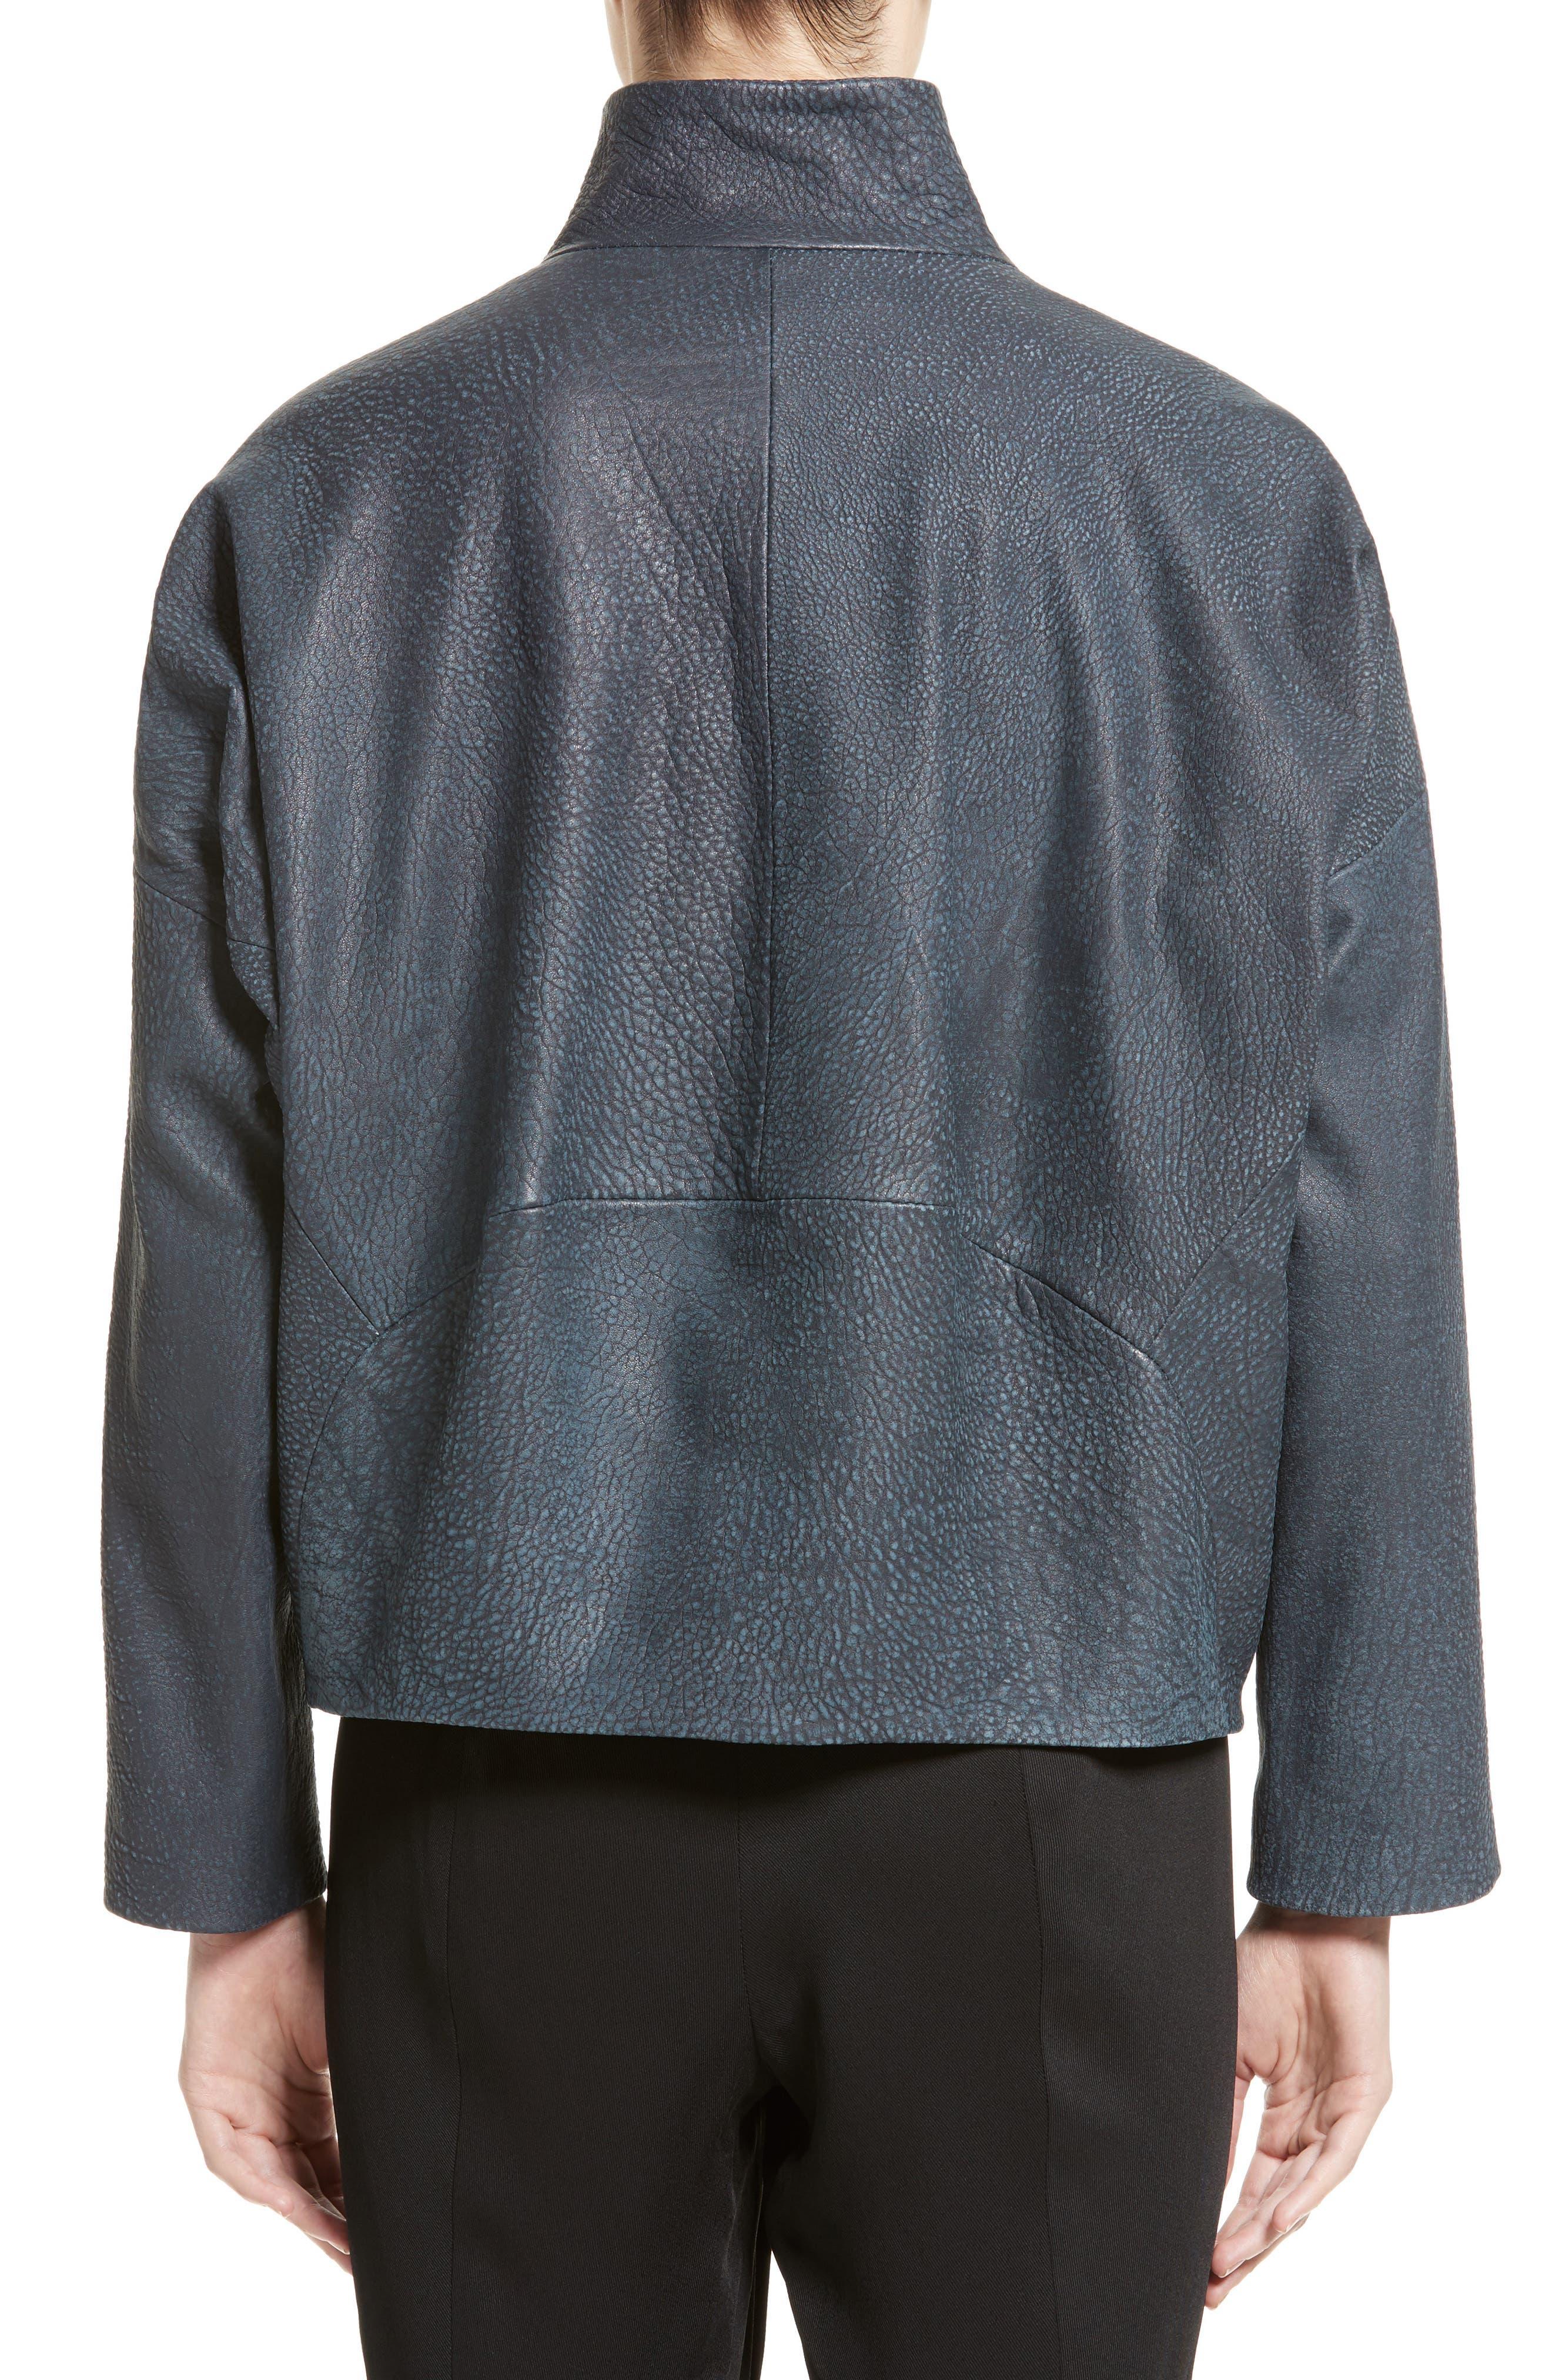 Osita Leather Bomber Jacket,                             Alternate thumbnail 2, color,                             002